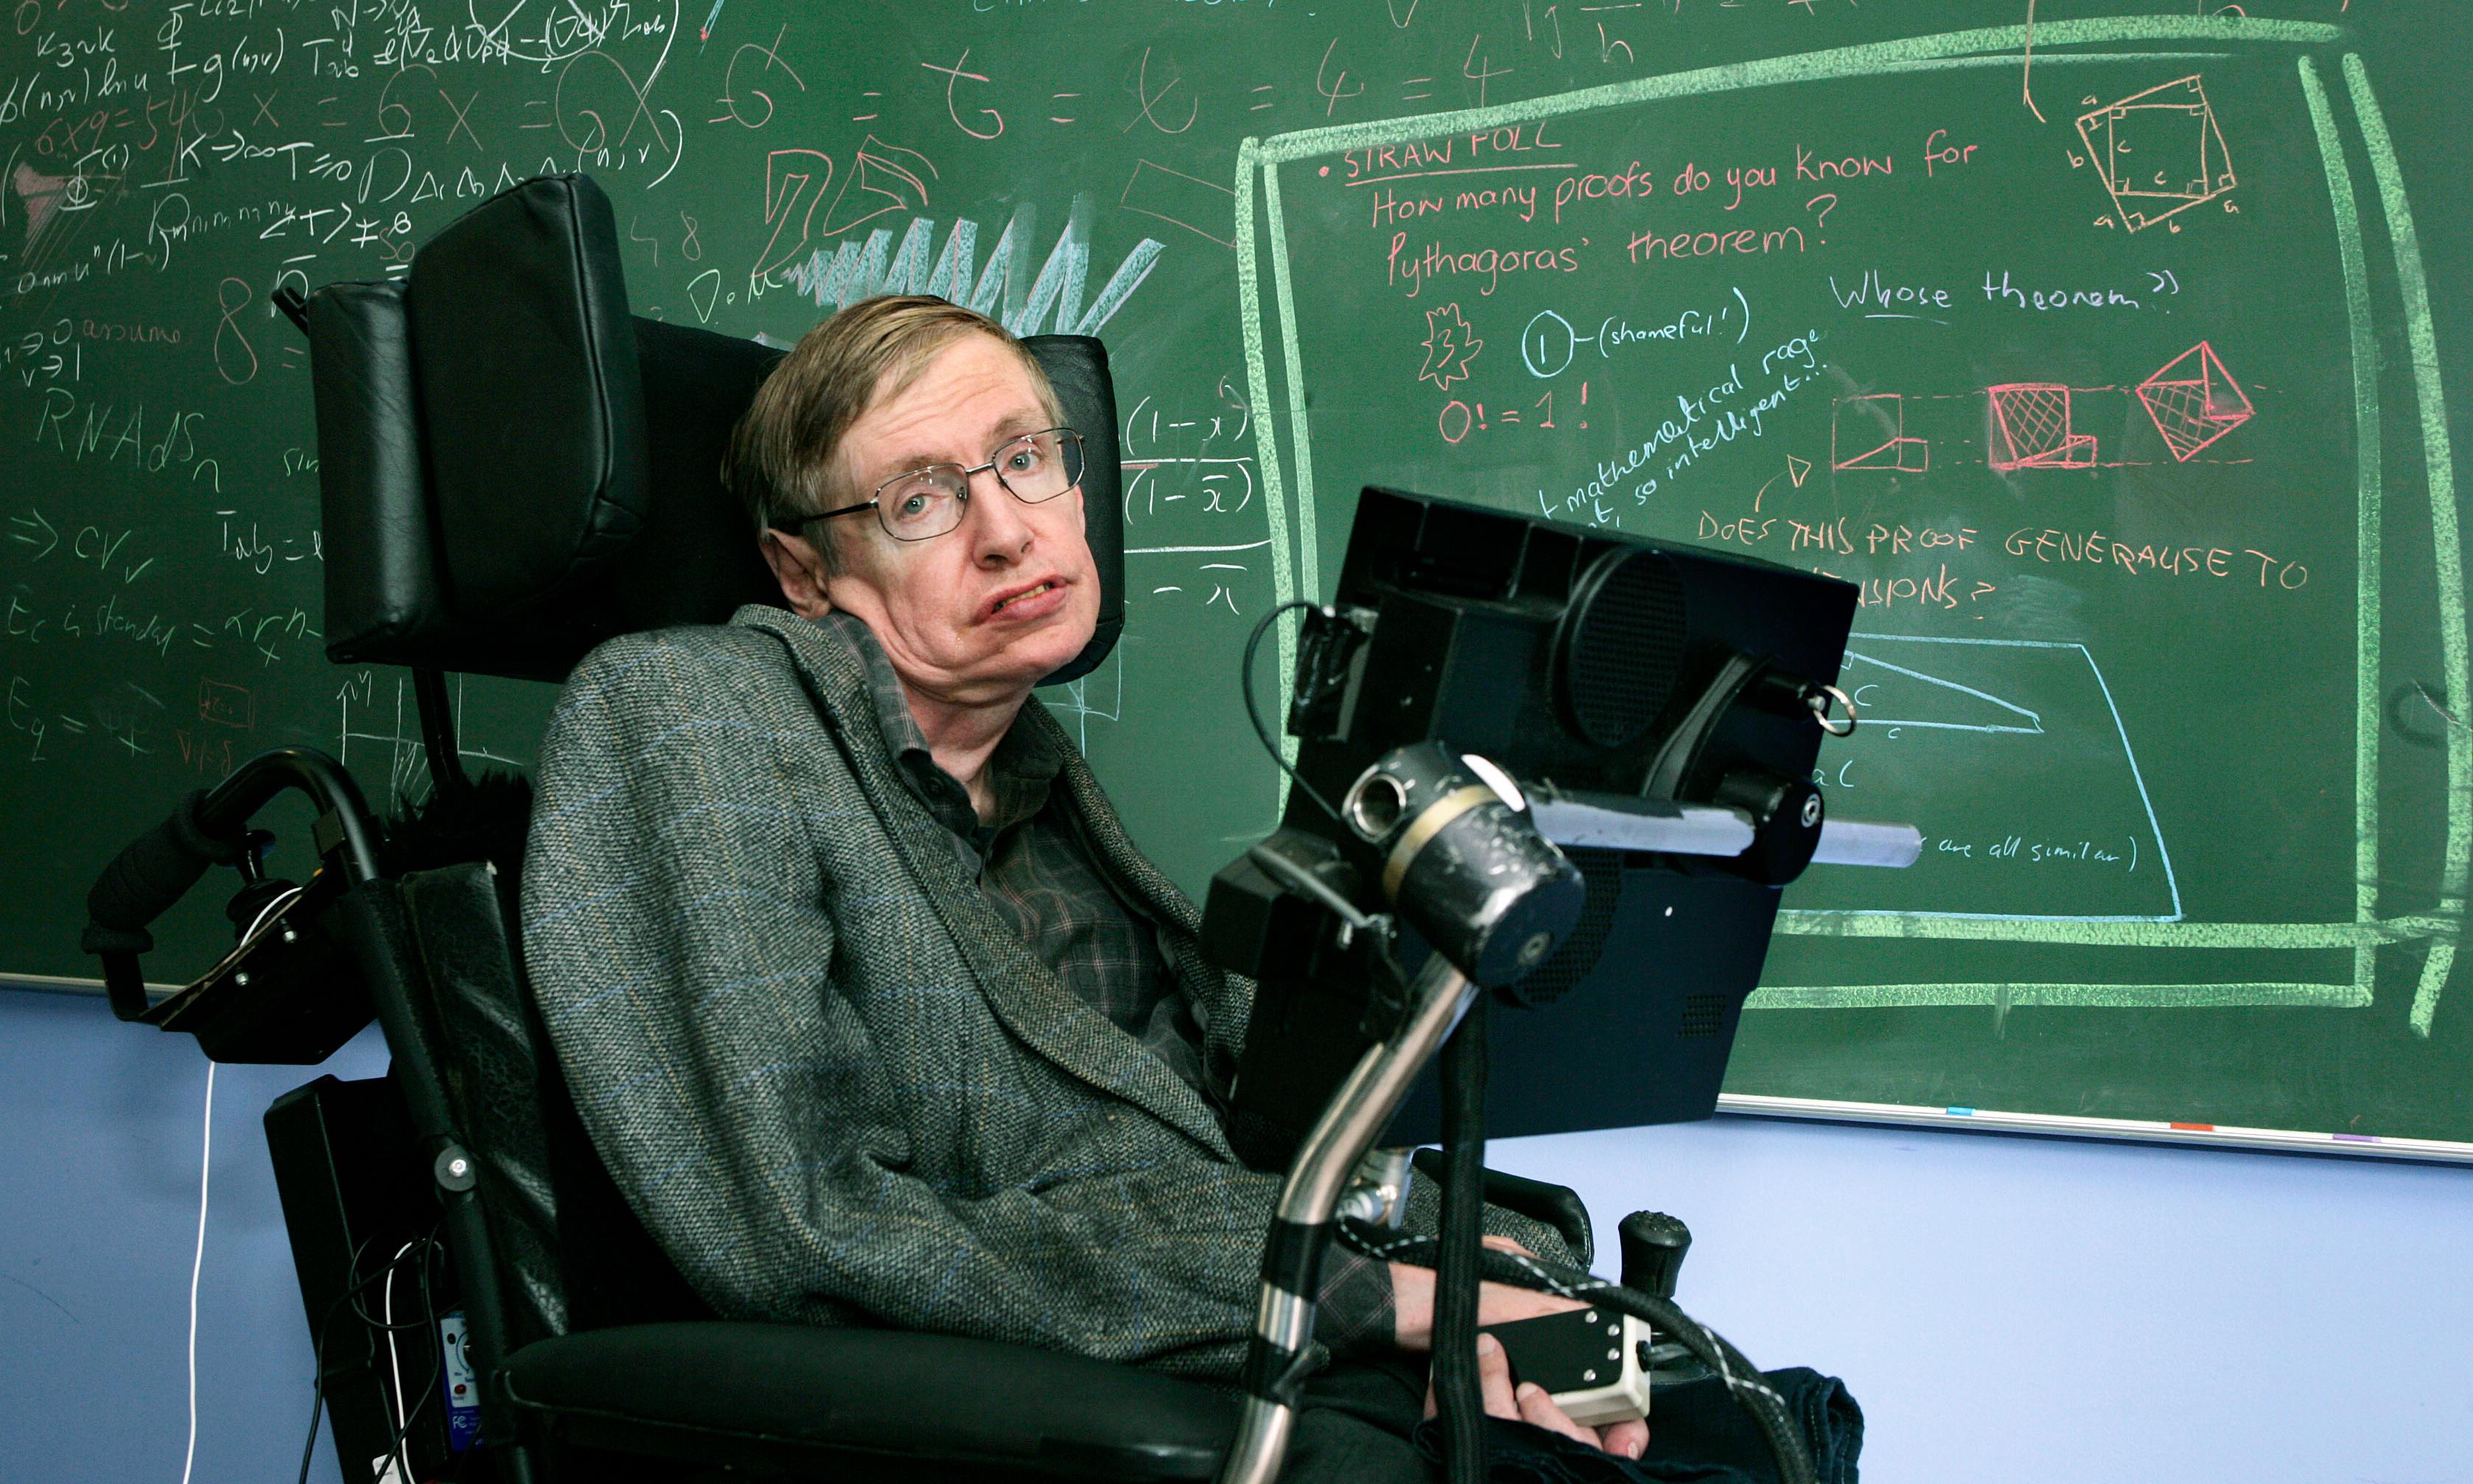 'Mind over matter': Stephen Hawking – obituary by Roger Penrose